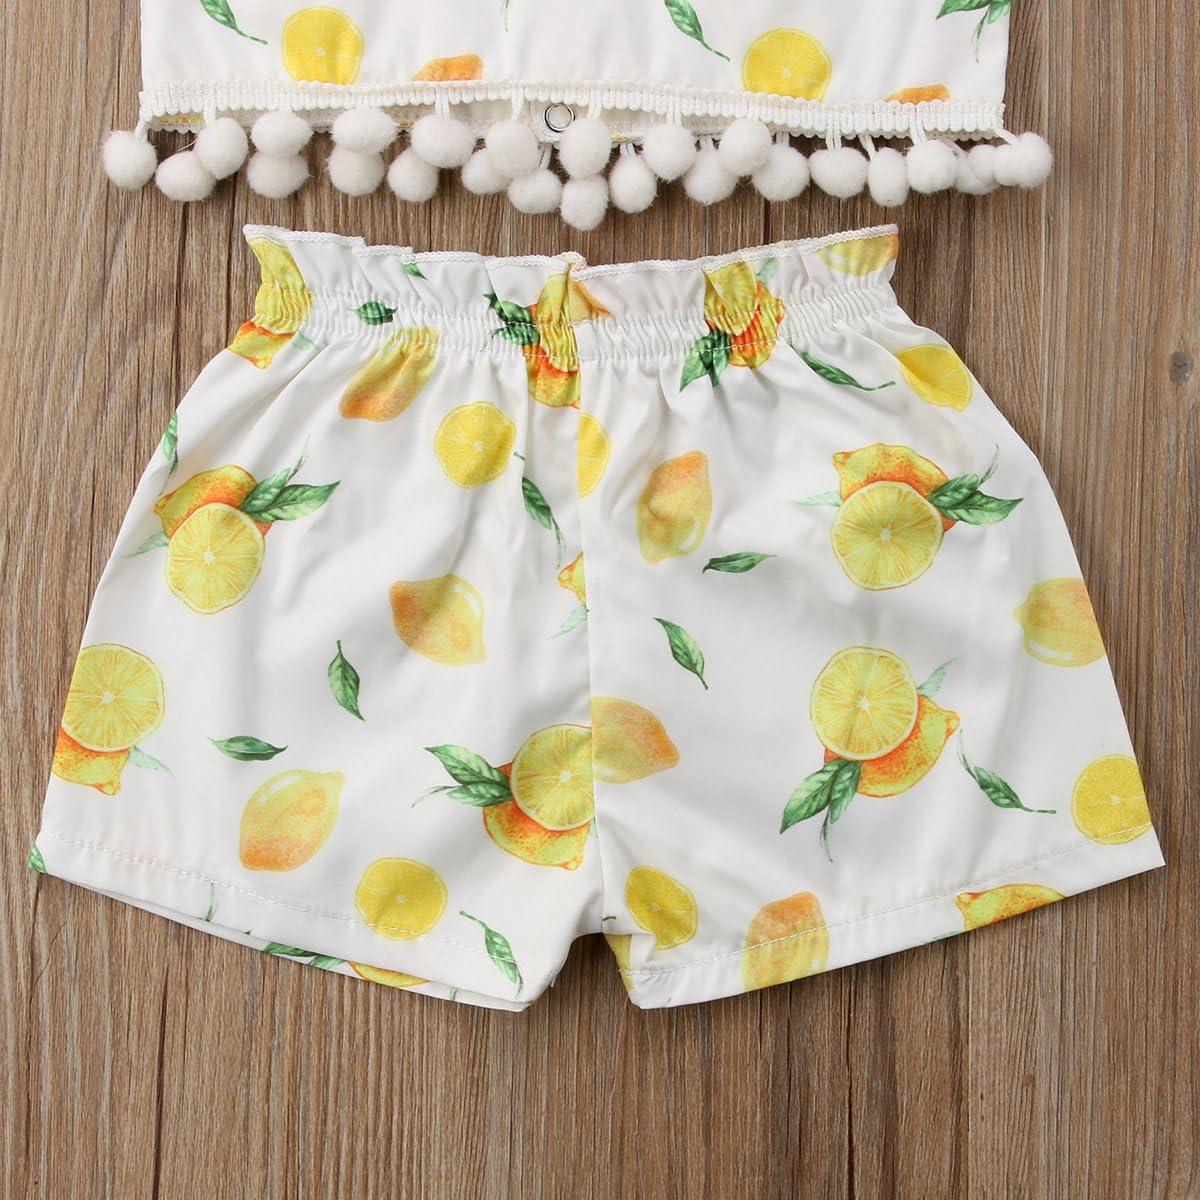 Headband Summer Outfit Cute Shorts Pants YAZAD Newborn Infant Toddler Baby Girl Lemon Top Sleeveless Crop Top Vest